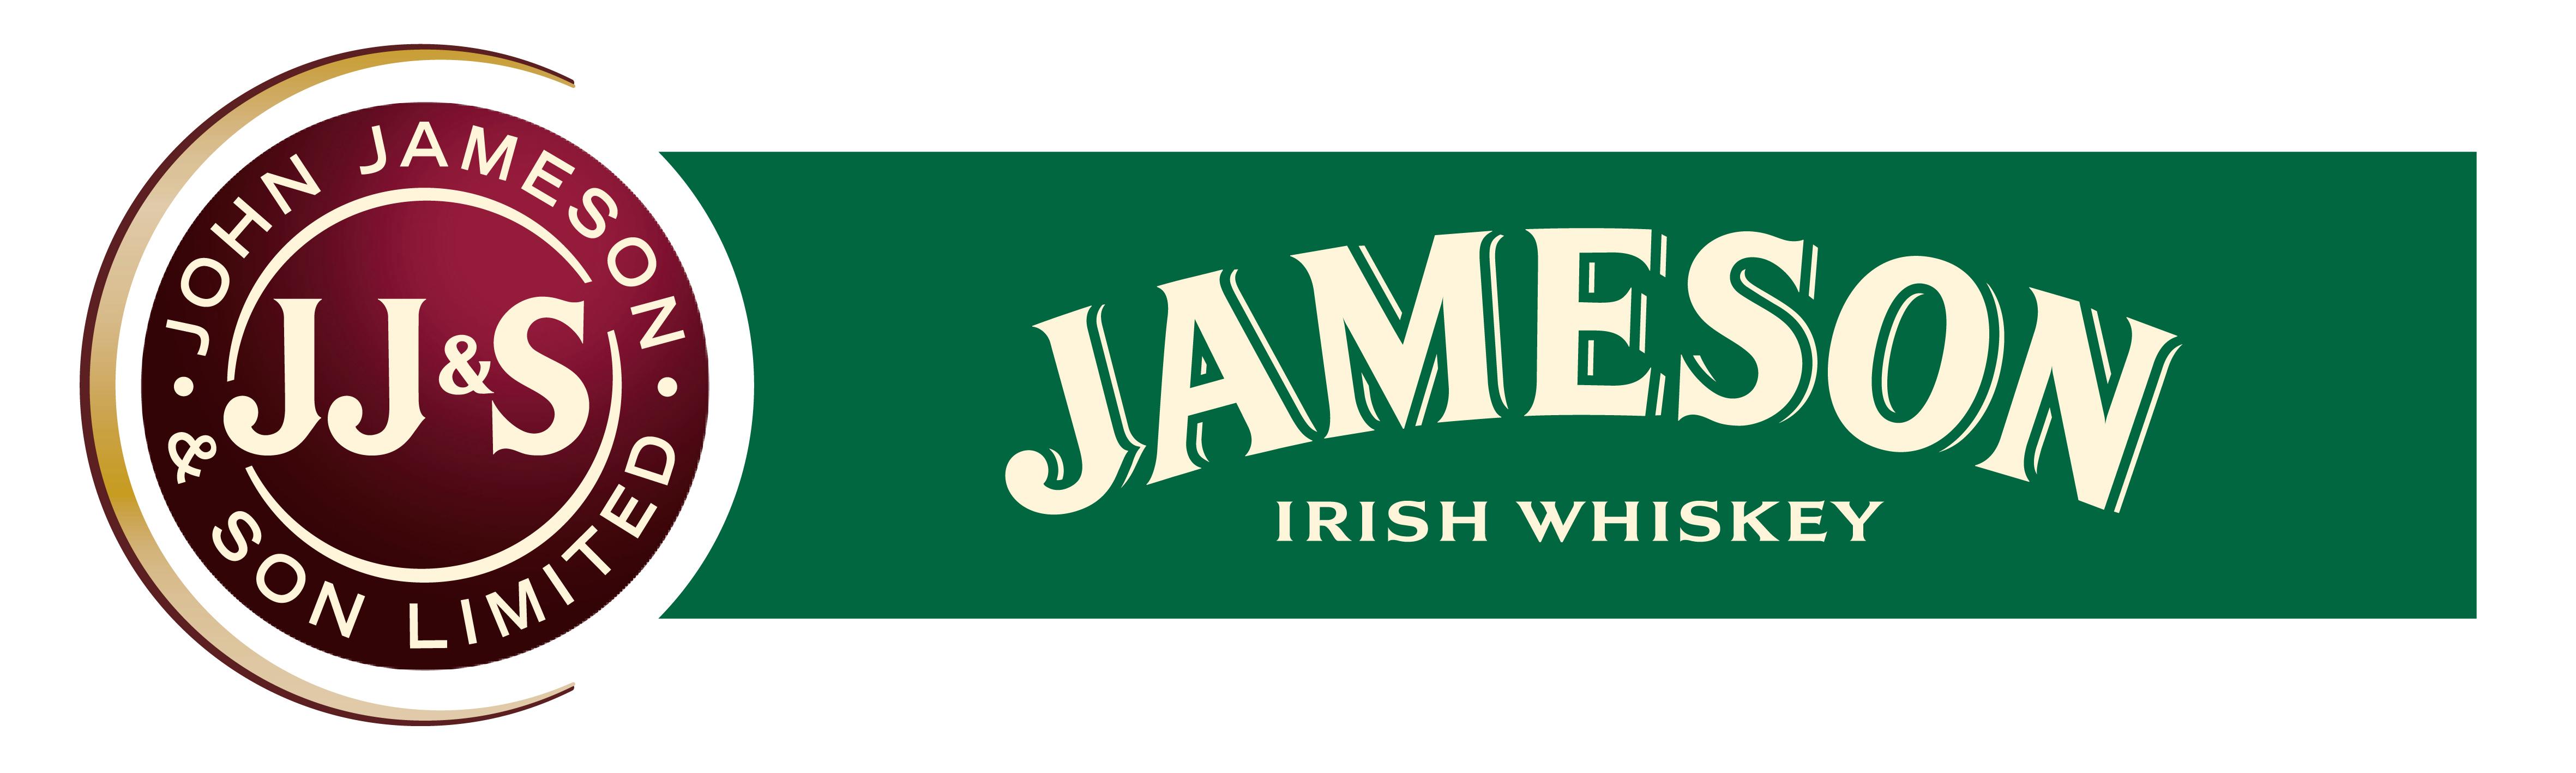 Jameson irish whiskey Logos.